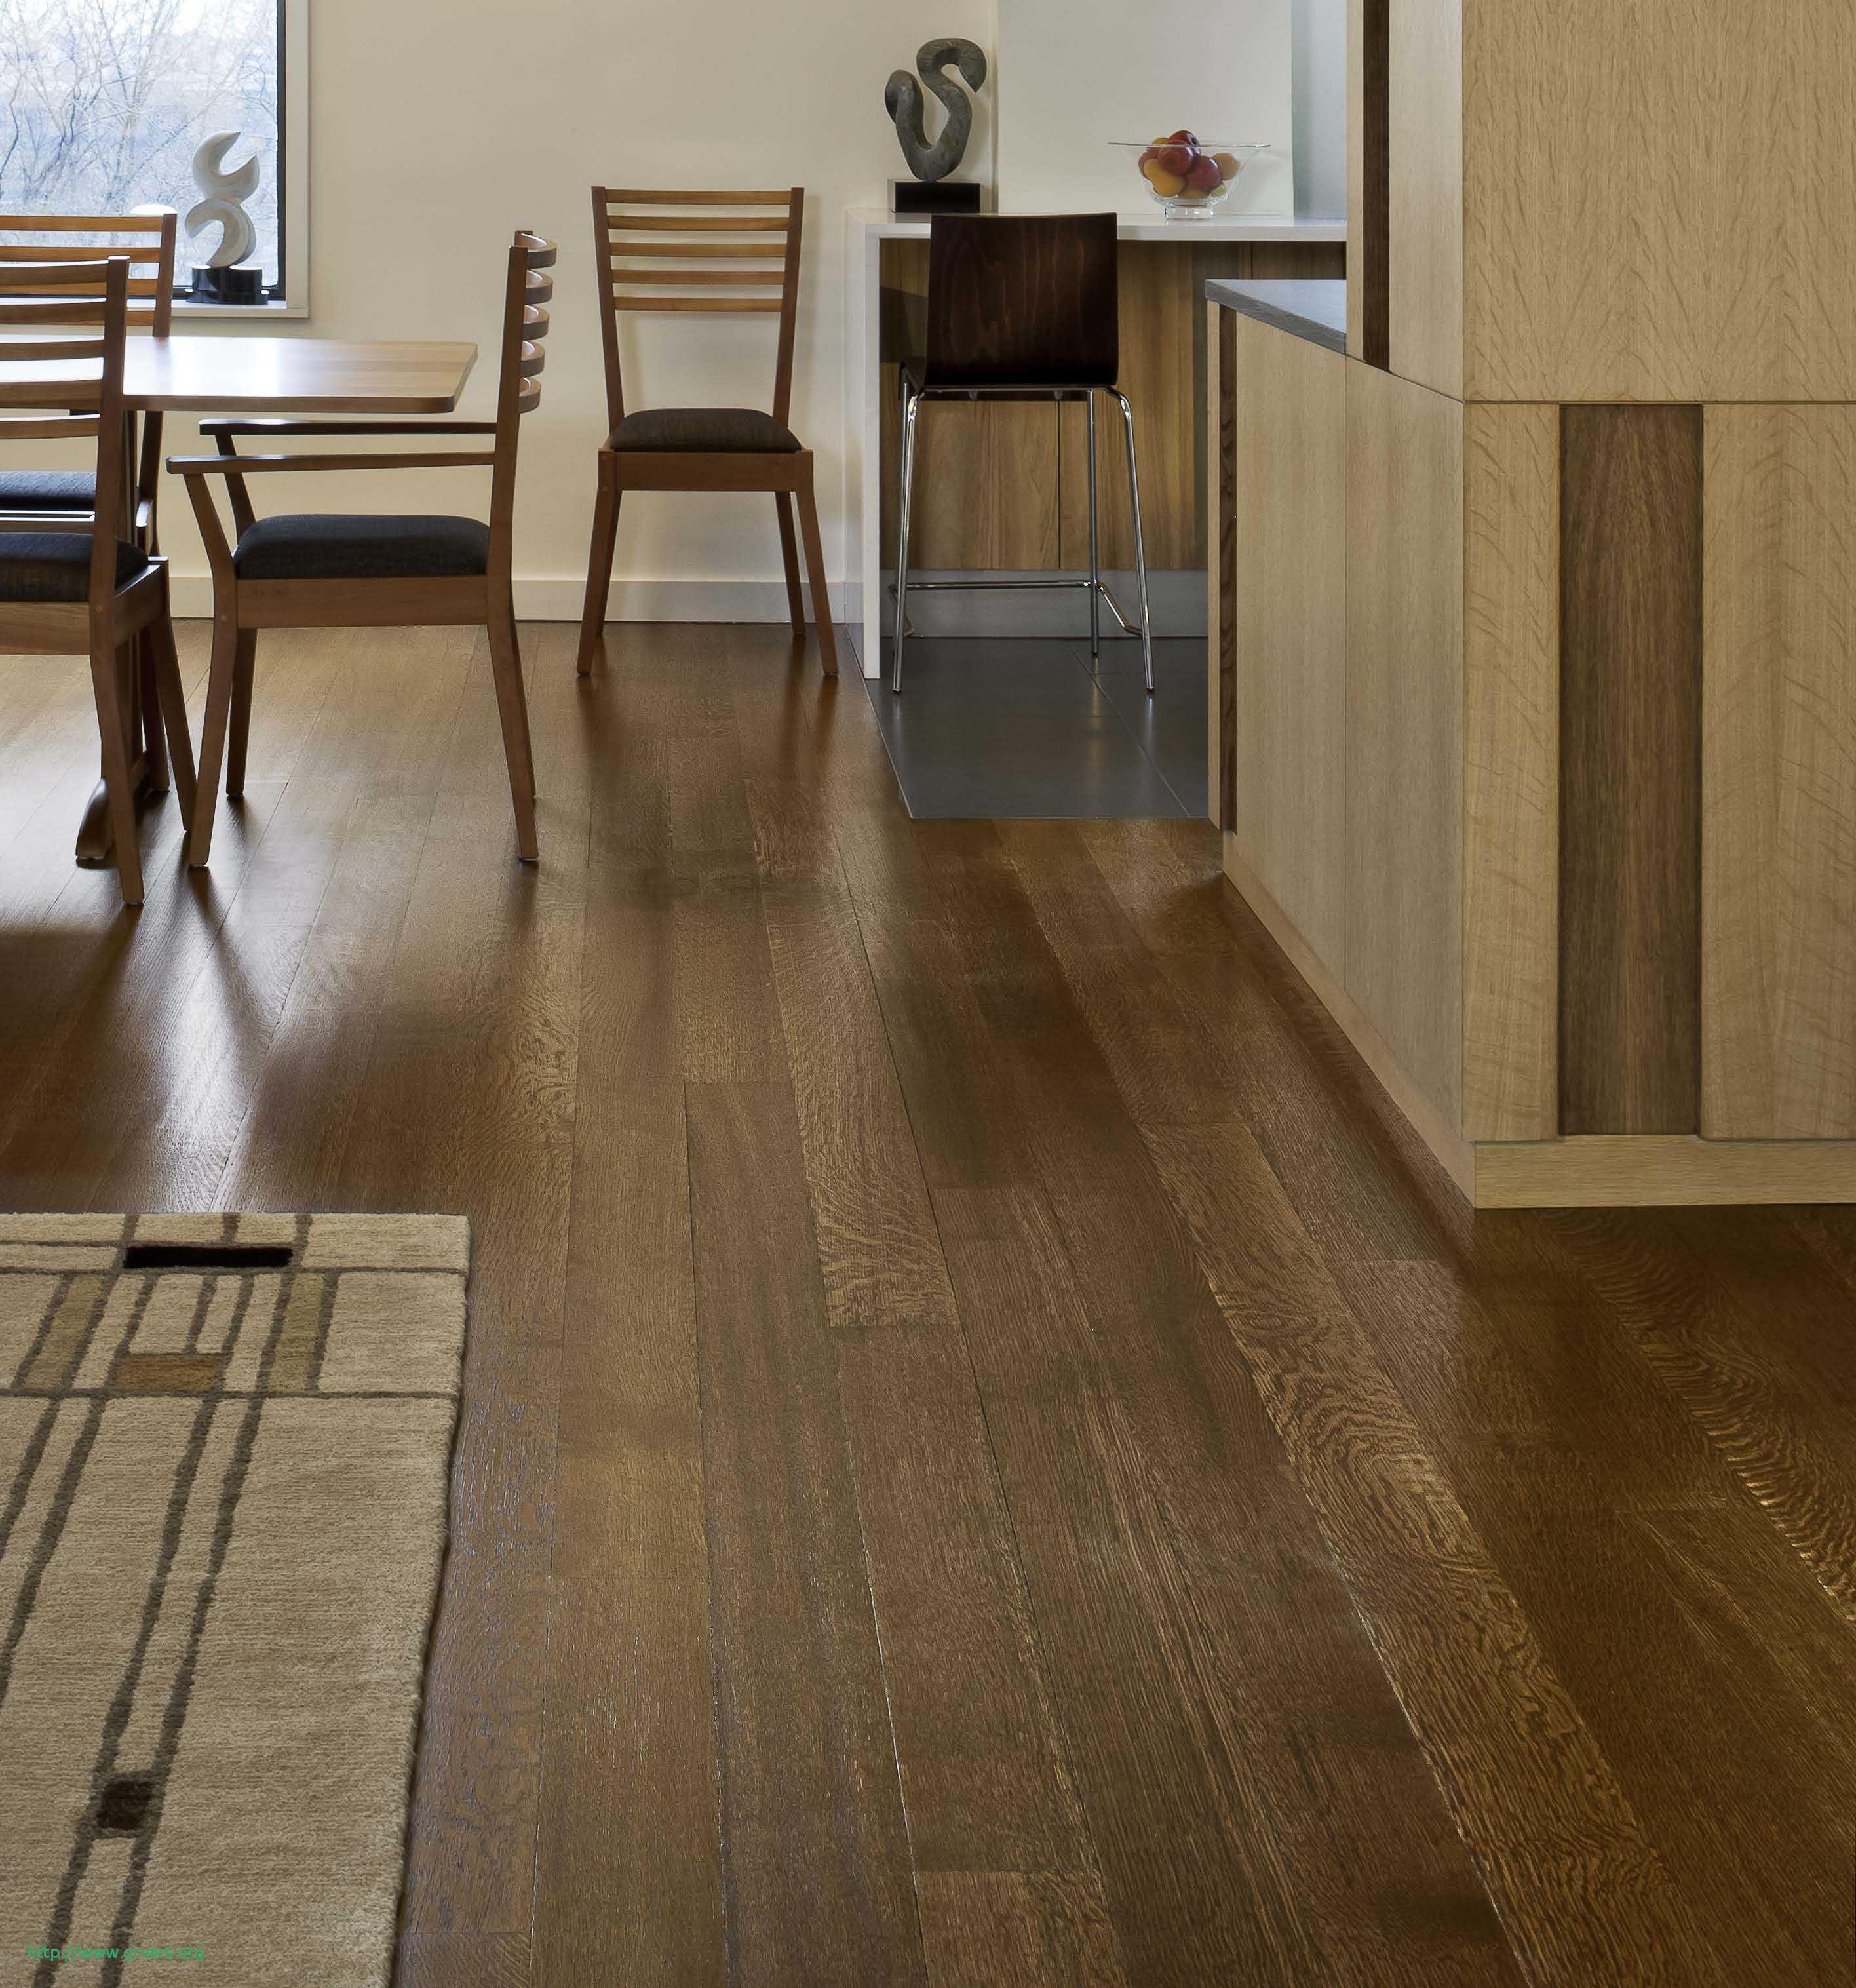 unfinished hardwood floor filler of 21 beau cheapest hardwood flooring in toronto ideas blog for cheapest hardwood flooring in toronto impressionnant fabulous discount hardwood flooring 0 floor brampton 25 toronto